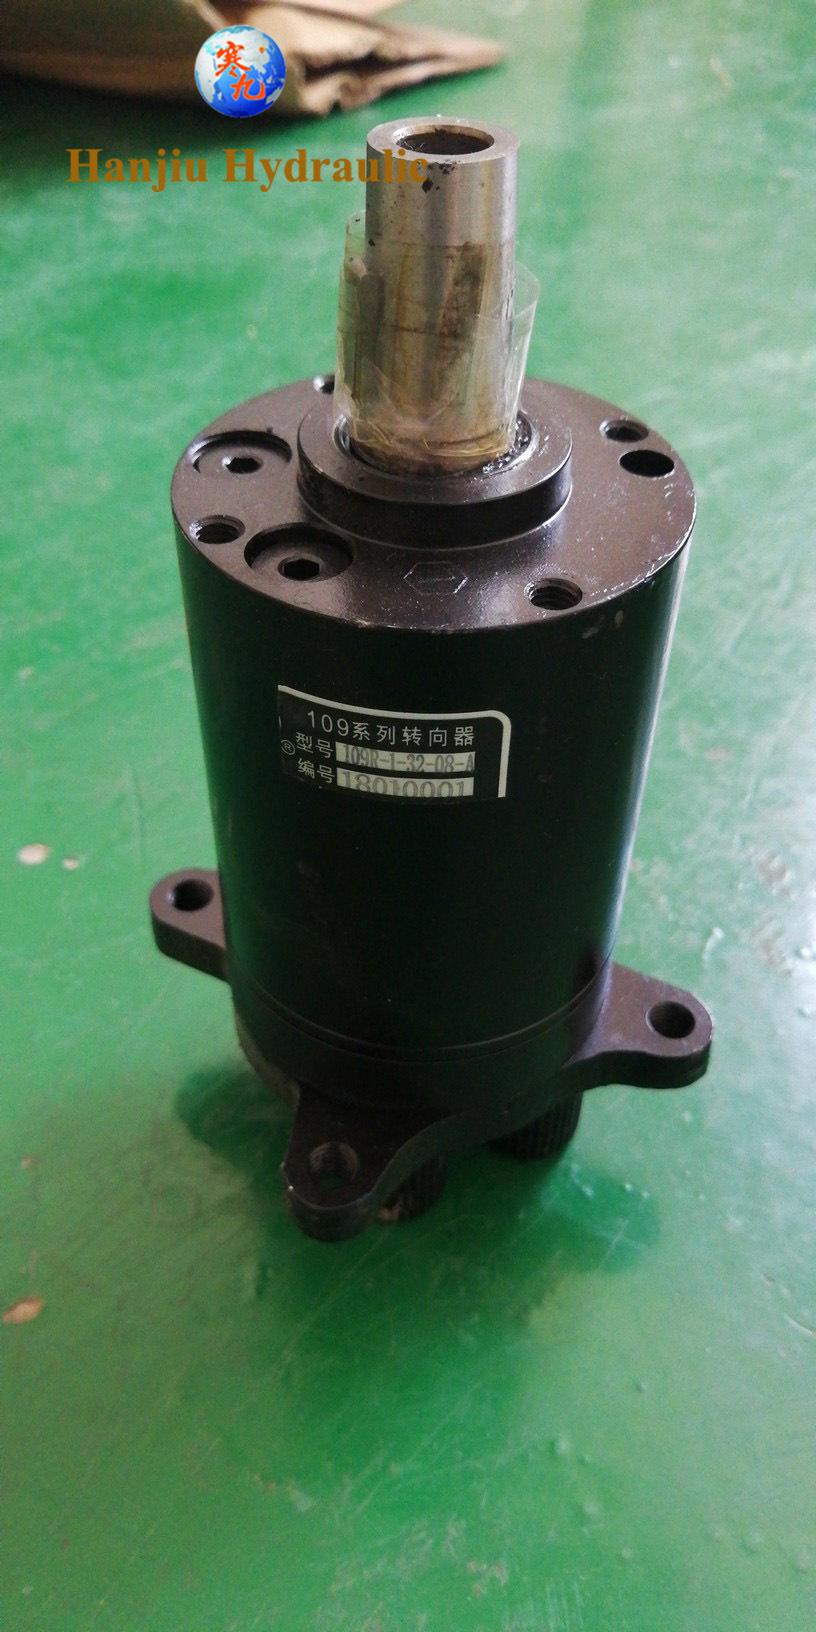 [Hot Item] Mini Steering Unit 109 Replace Danfoss Ospm 150L0061